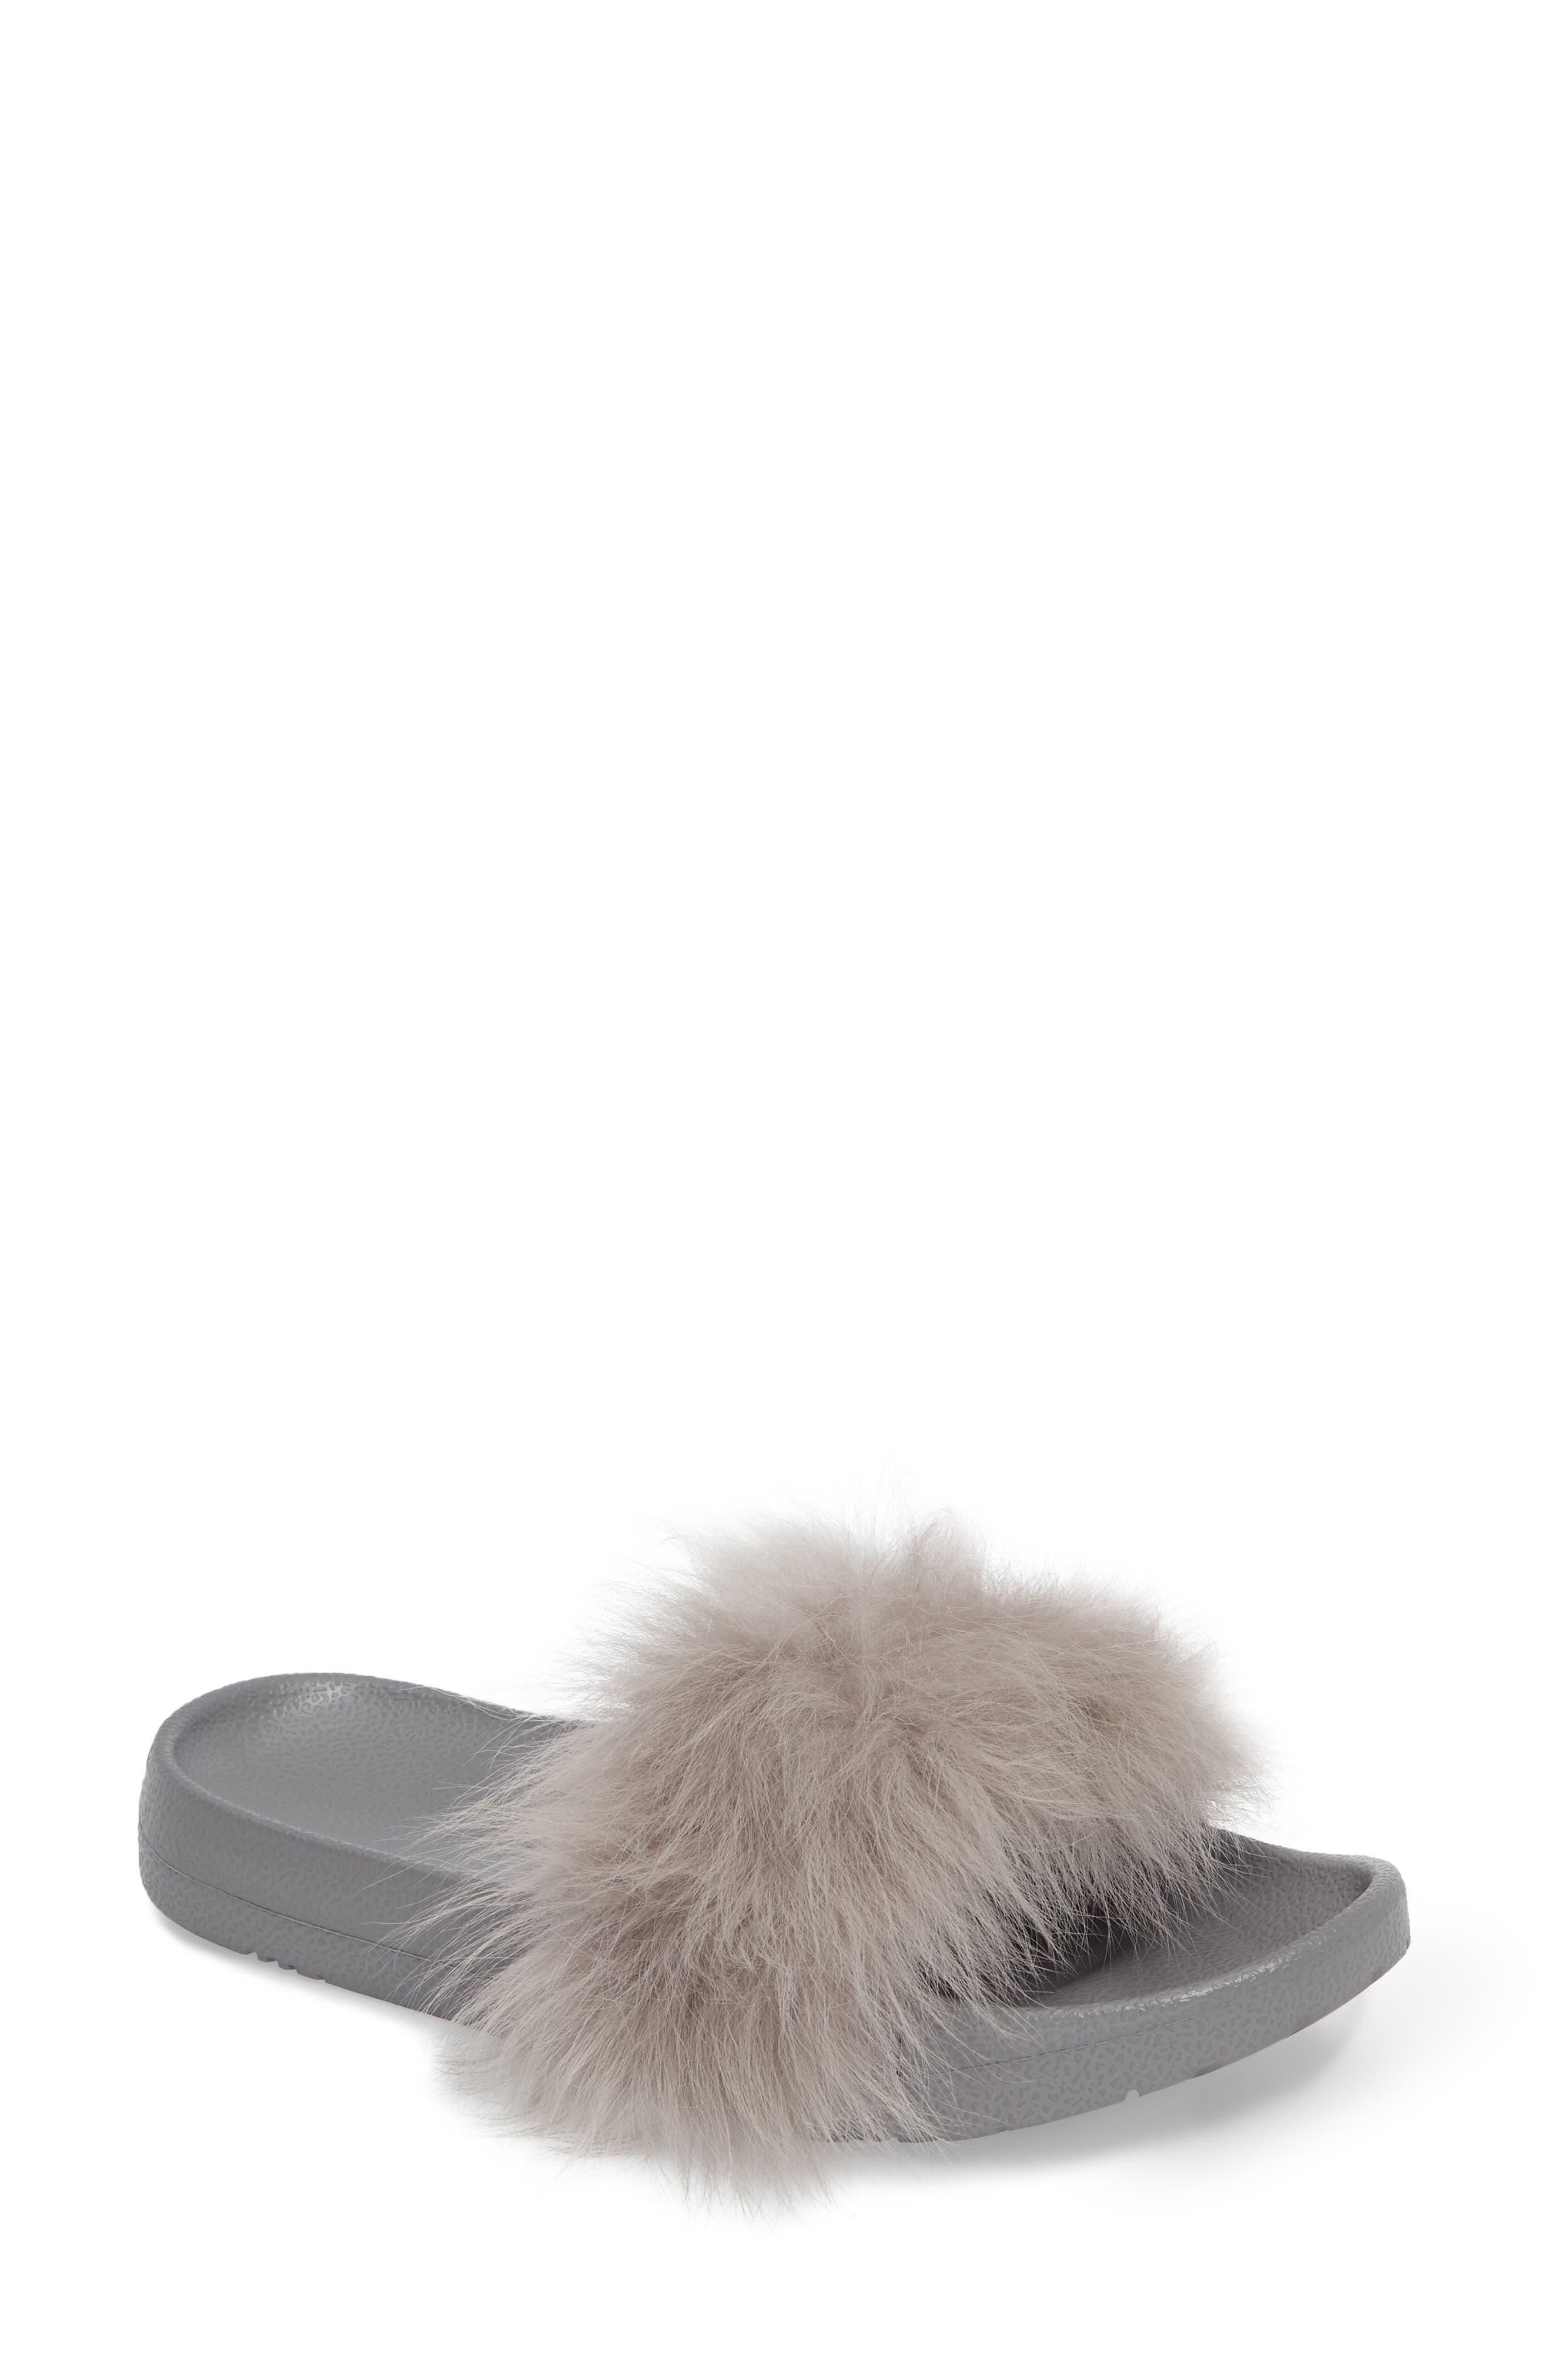 Royale Genuine Shearling Slide Sandal,                             Main thumbnail 1, color,                             Seal